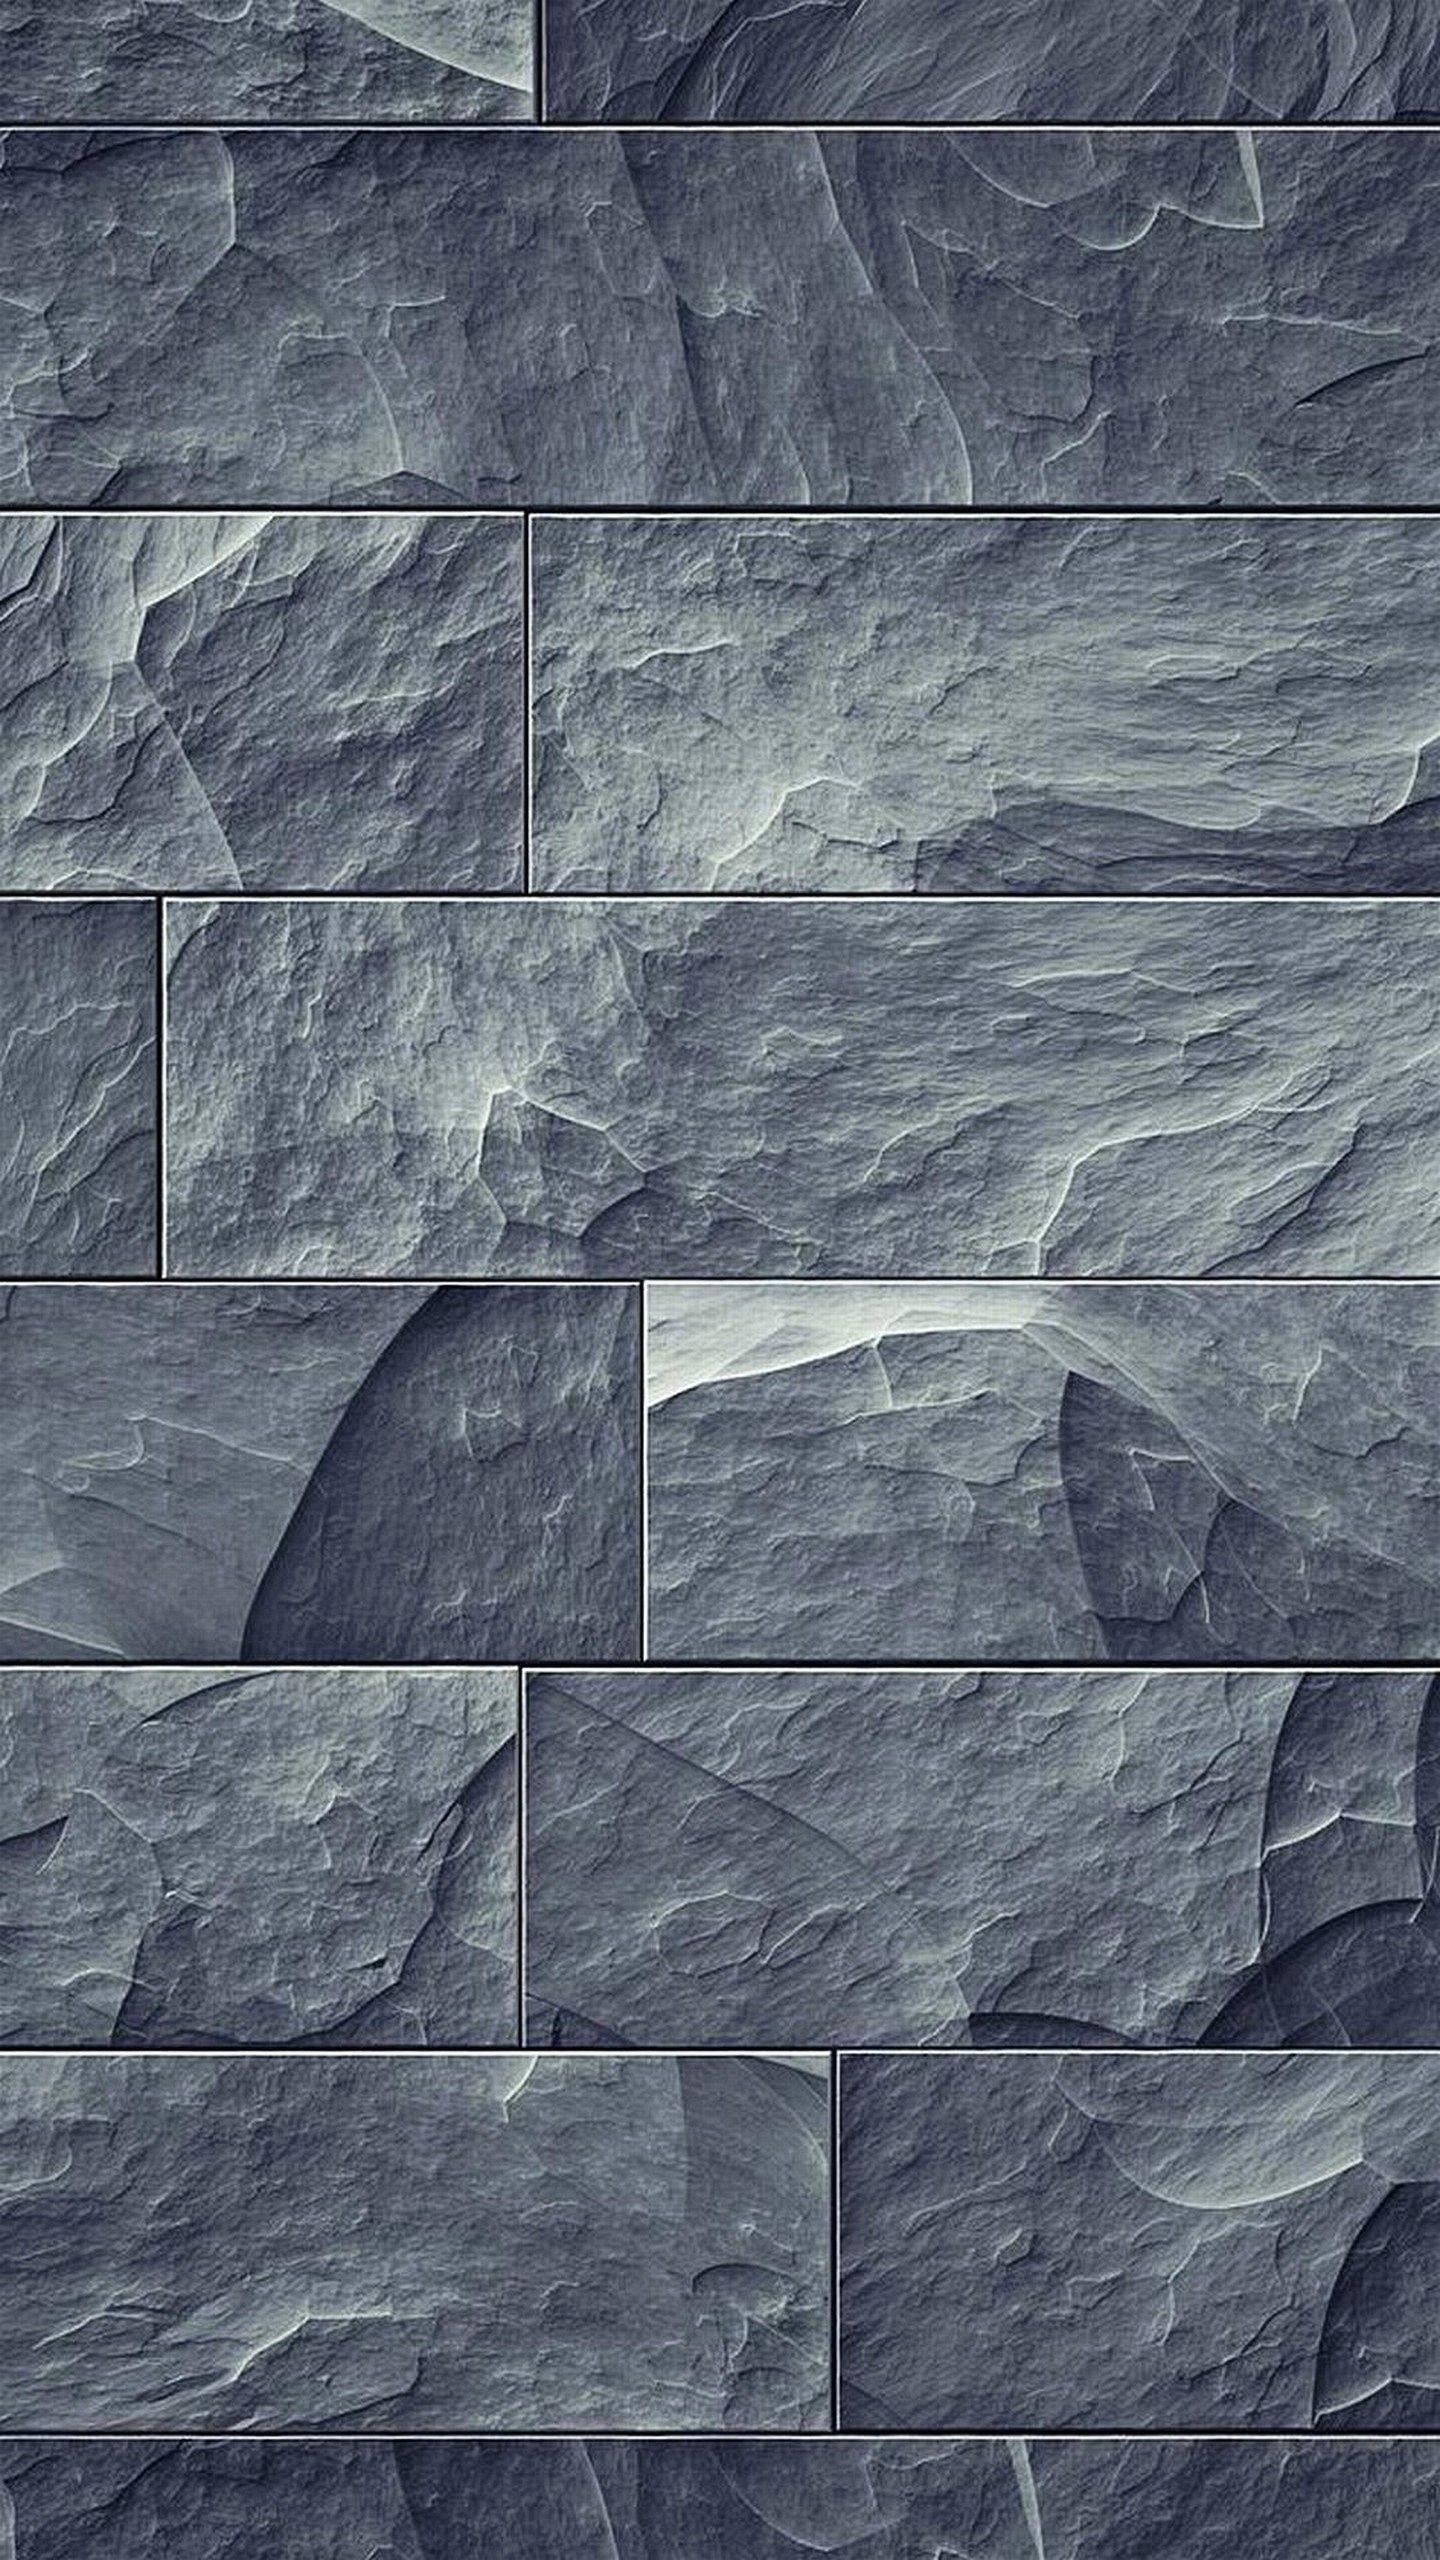 Samsung galaxy s6 wallpaper quad 1440 2560 23